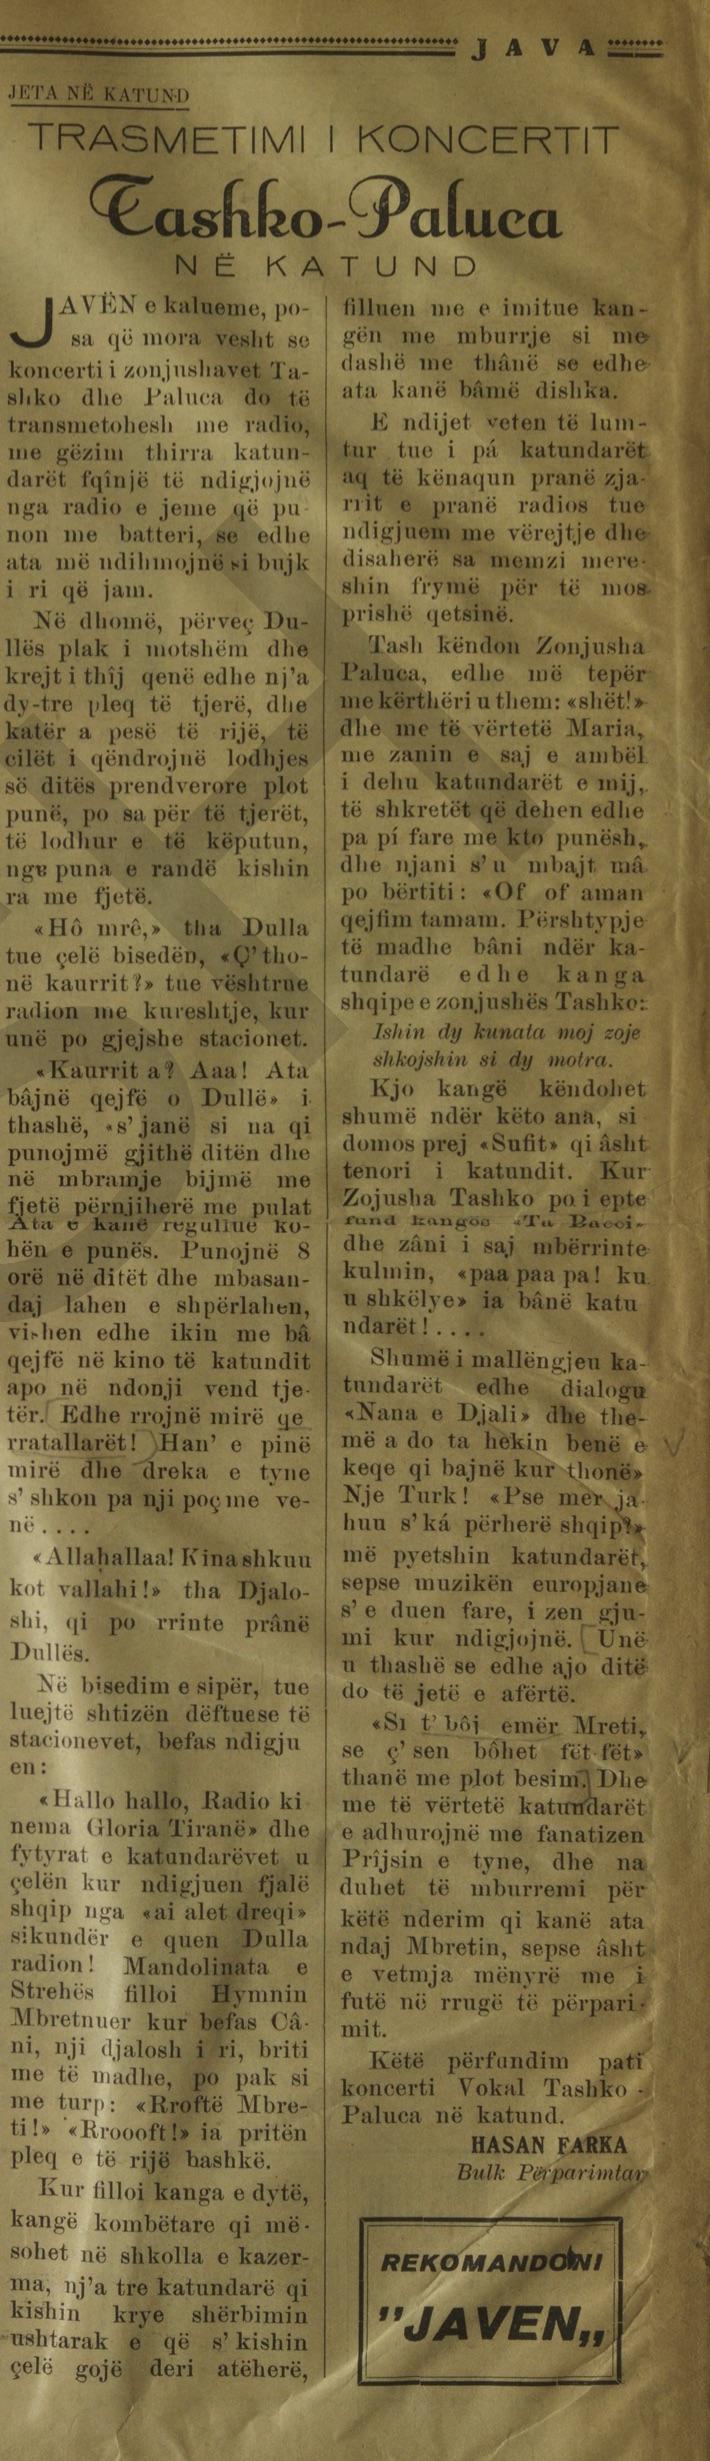 Hasan Farka gazeta Java 1938-39